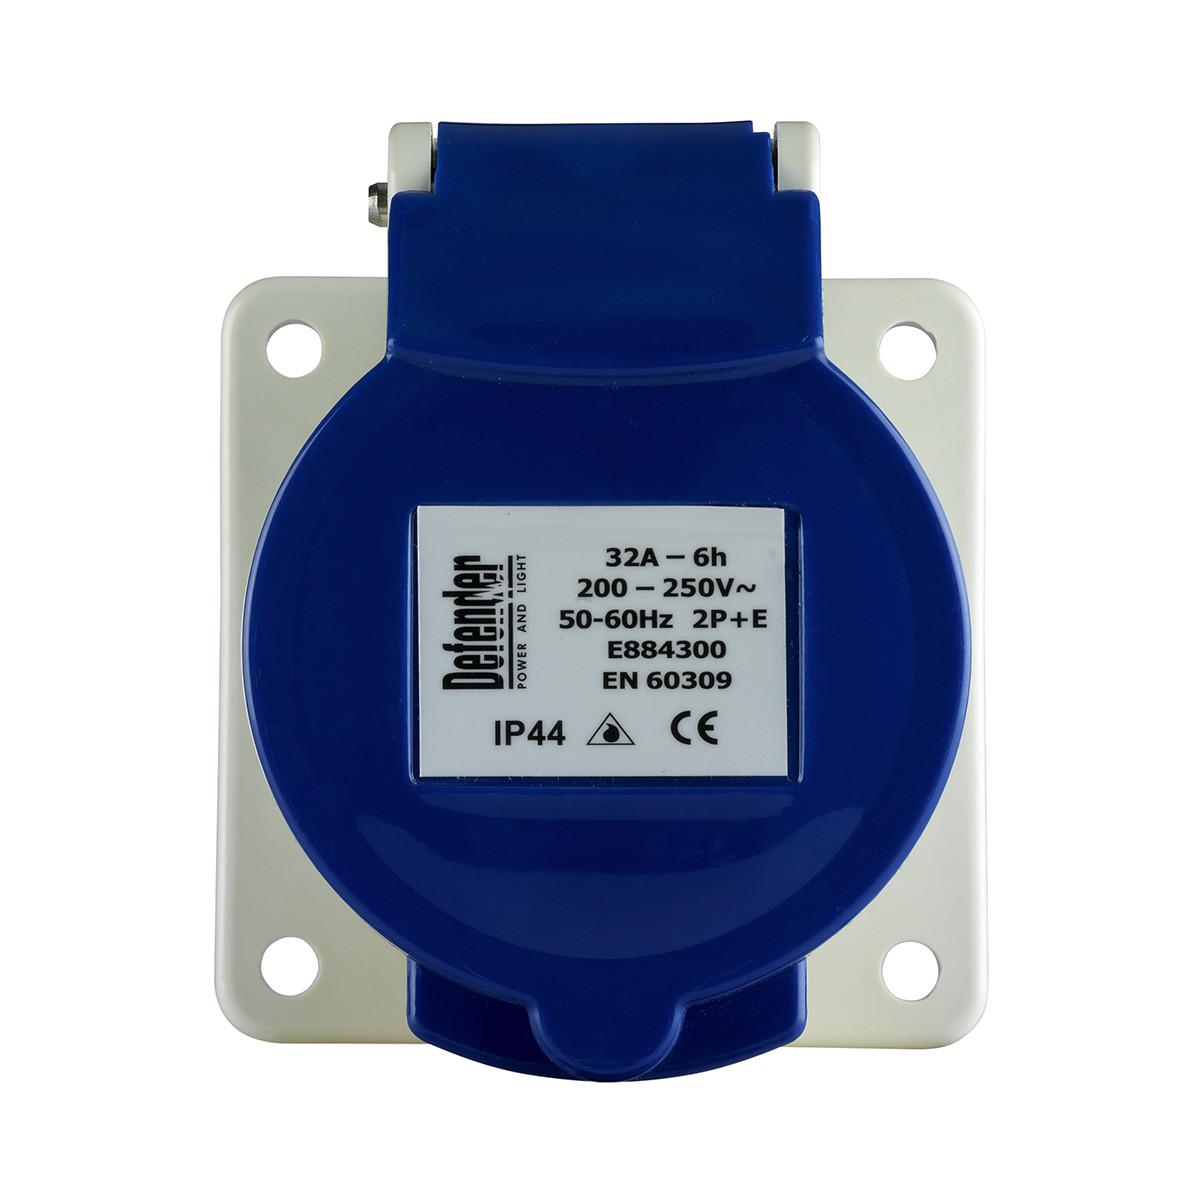 32A 240V Panel Socket IP44